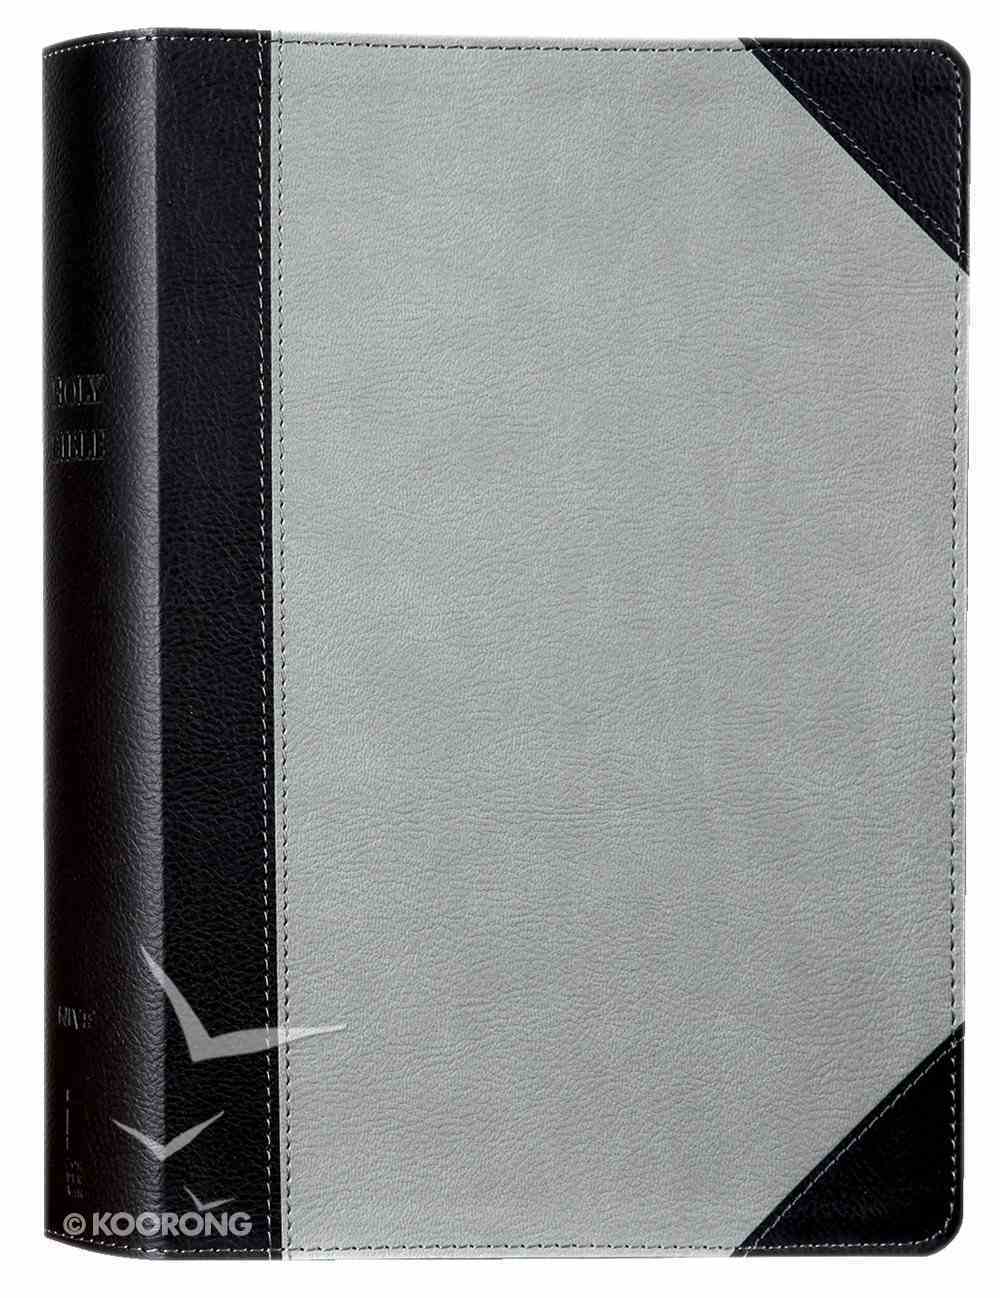 NIV Faithlife Illustrated Study Bible Gray/Black Premium Imitation Leather